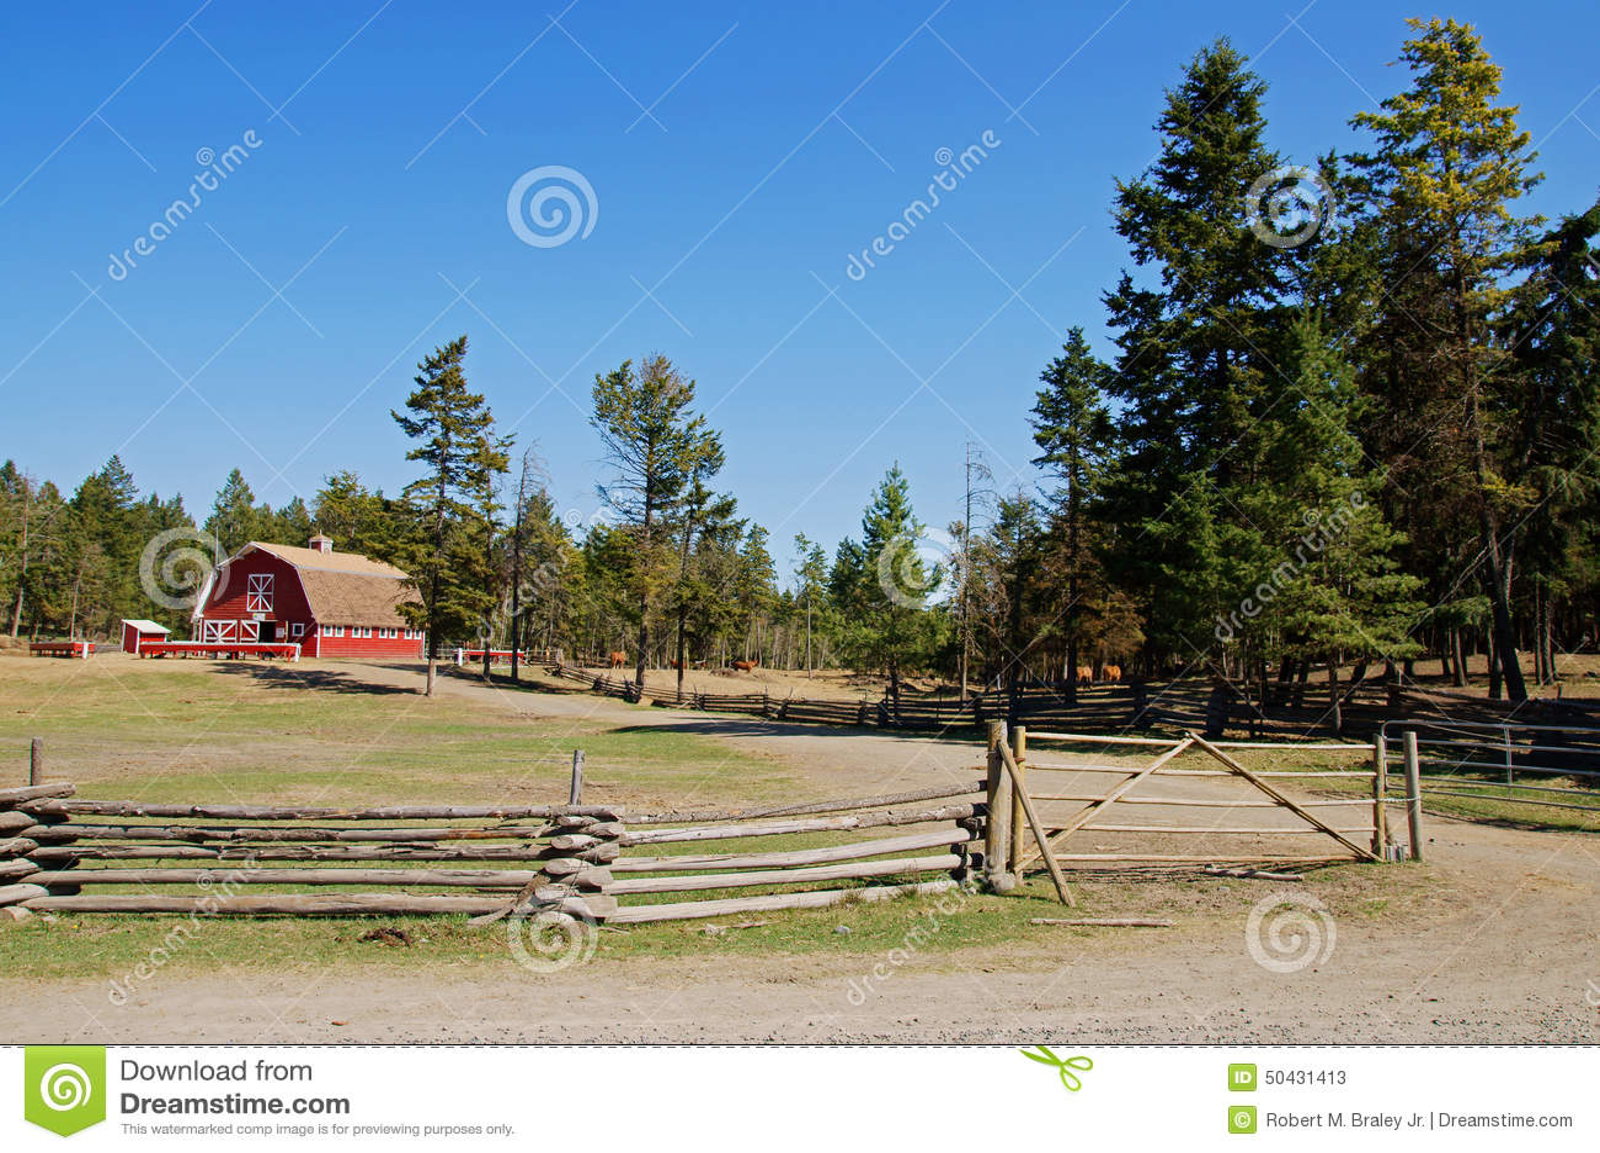 Vintage red barn ranch